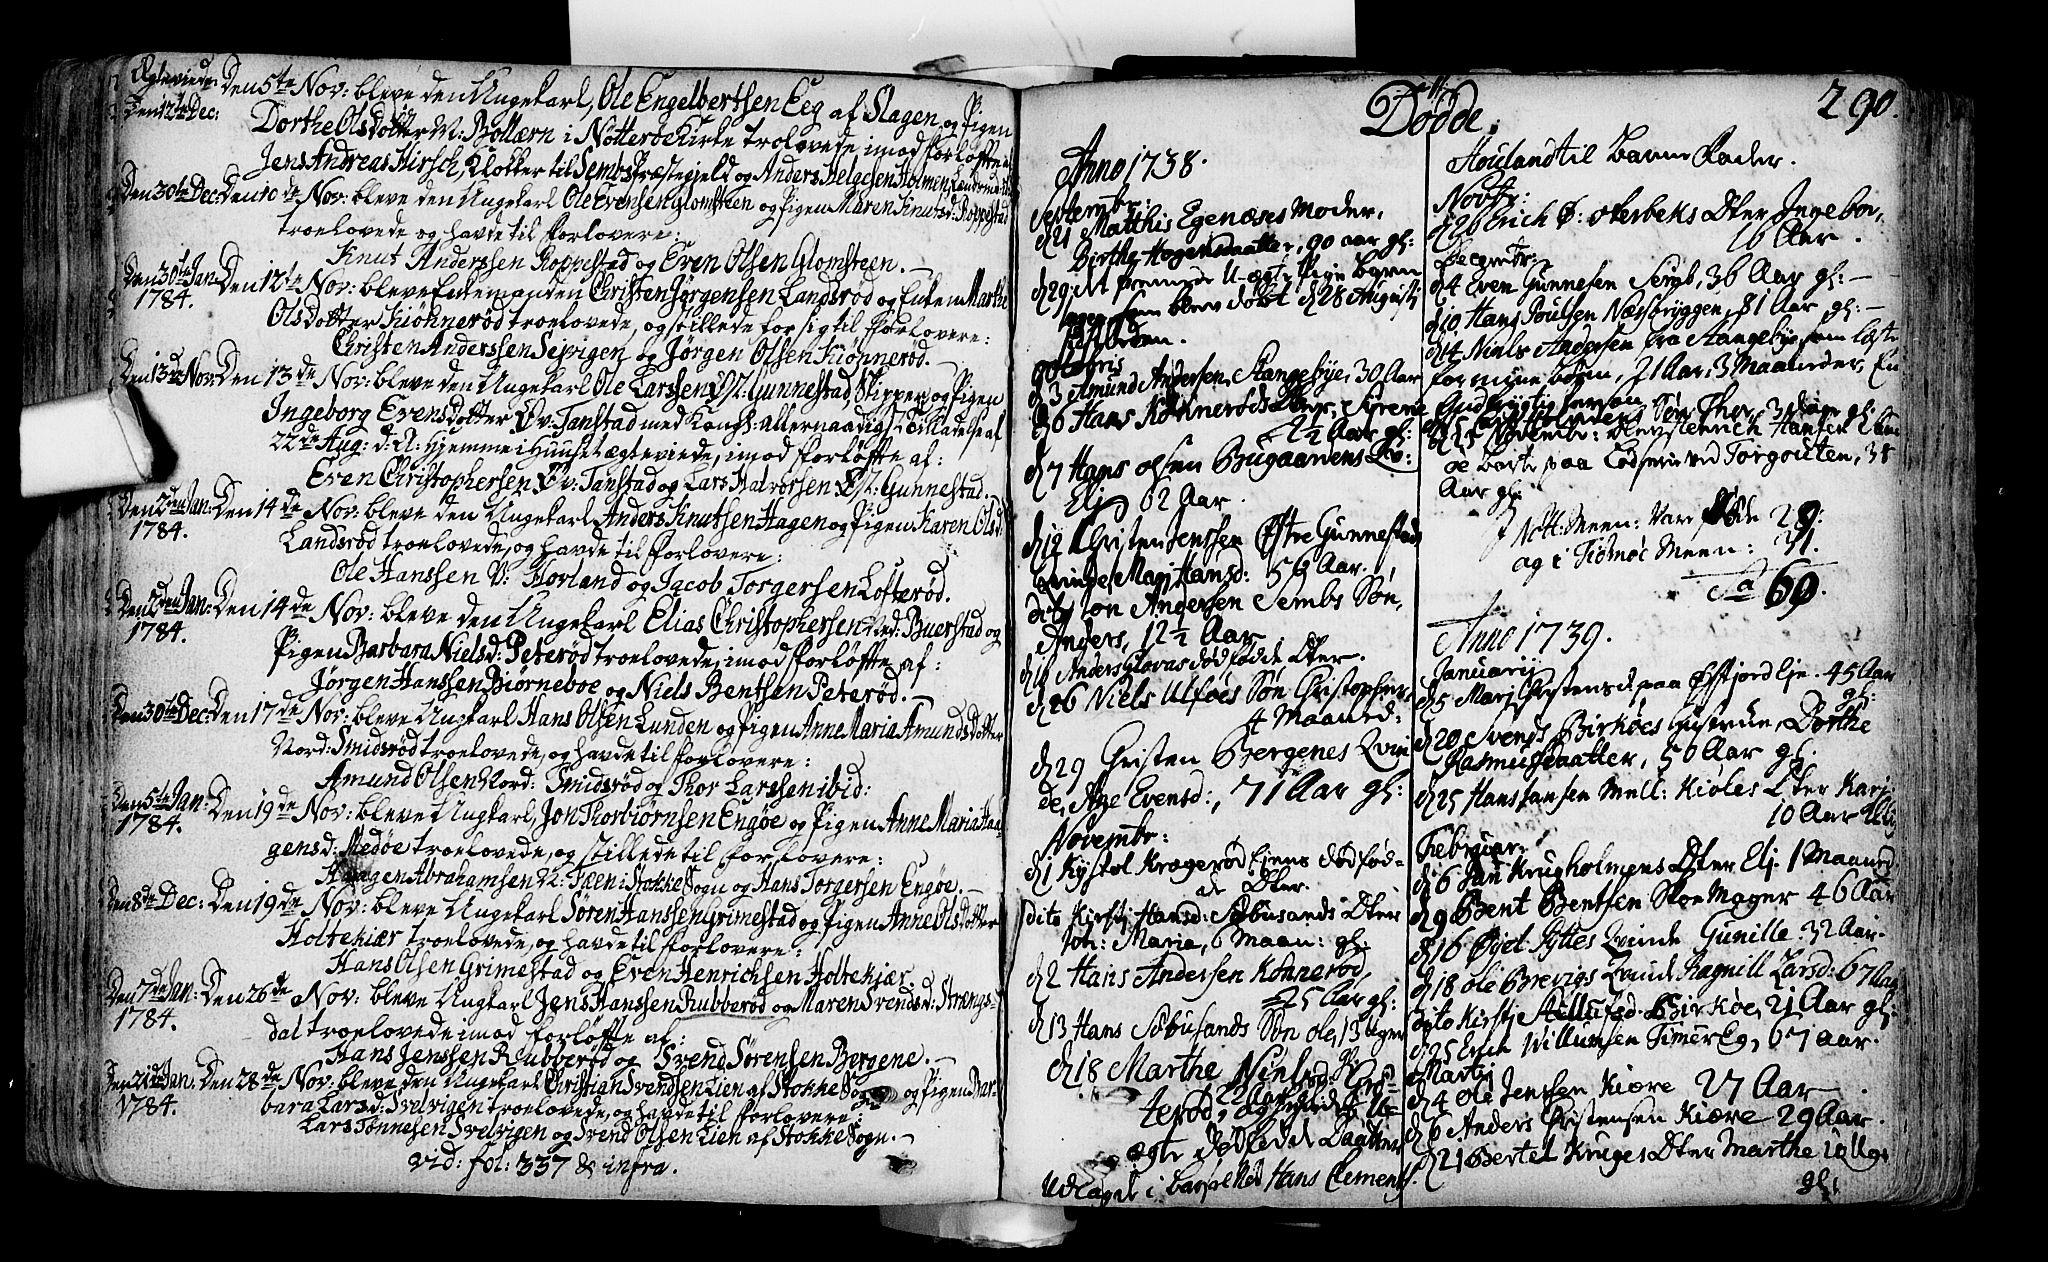 SAKO, Nøtterøy kirkebøker, F/Fa/L0002: Ministerialbok nr. I 2, 1738-1790, s. 290